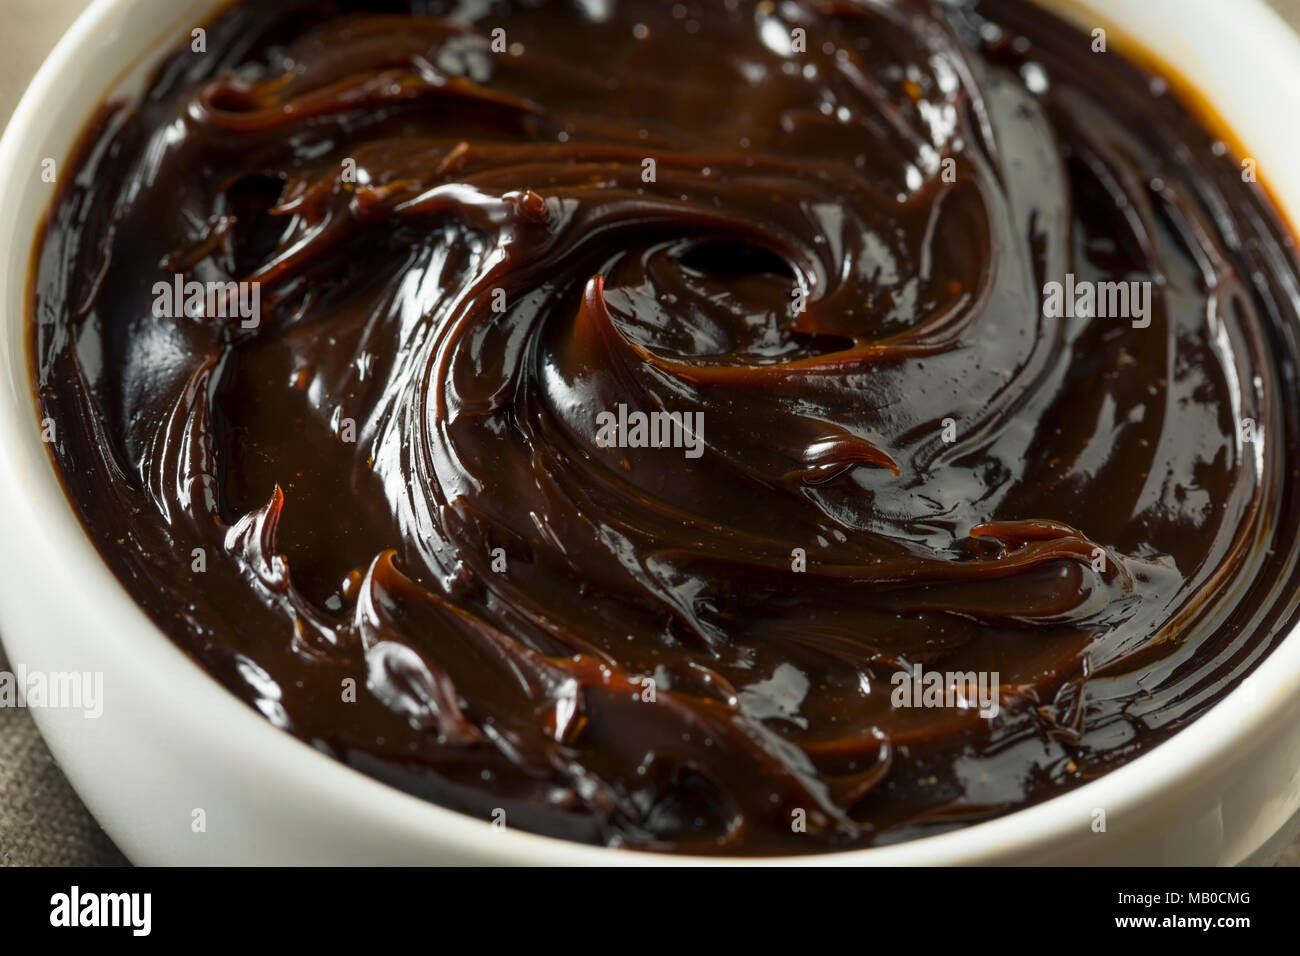 Delicious Australian Dark Yeast Extract Spread for Toast - Stock Image